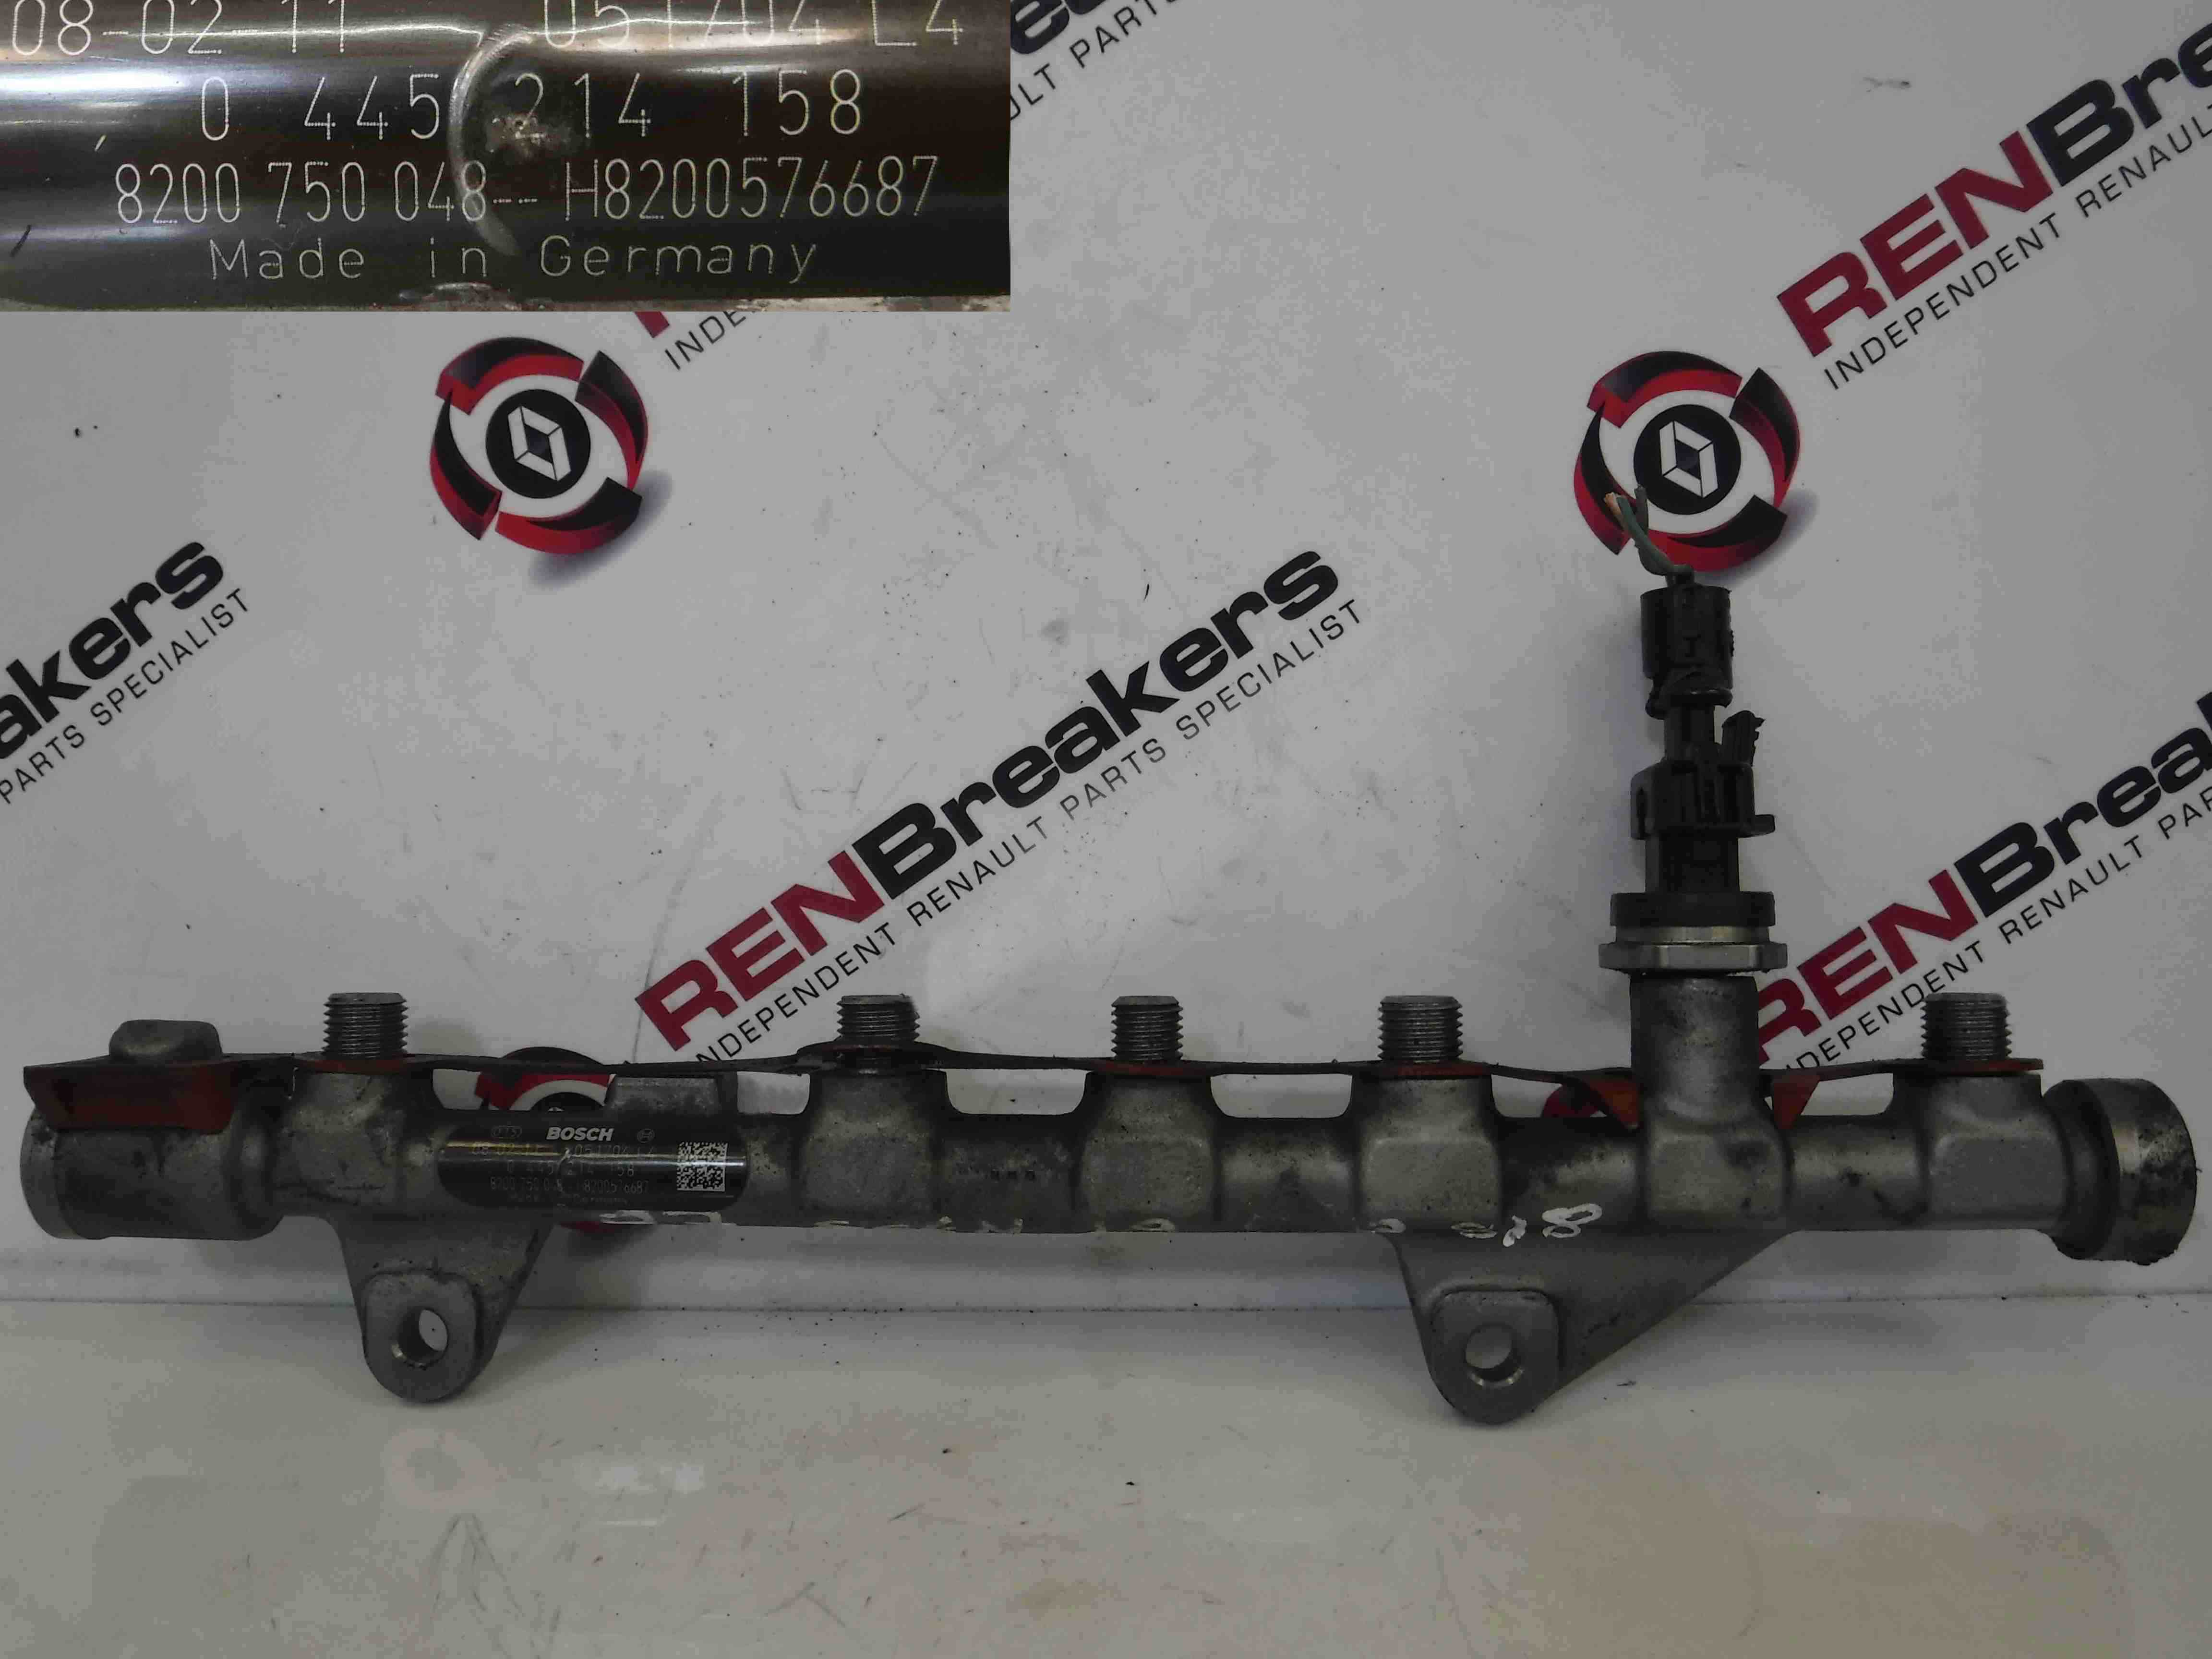 Renault Fuel Pressure Diagram : Renault scenic dci fuel injector rail